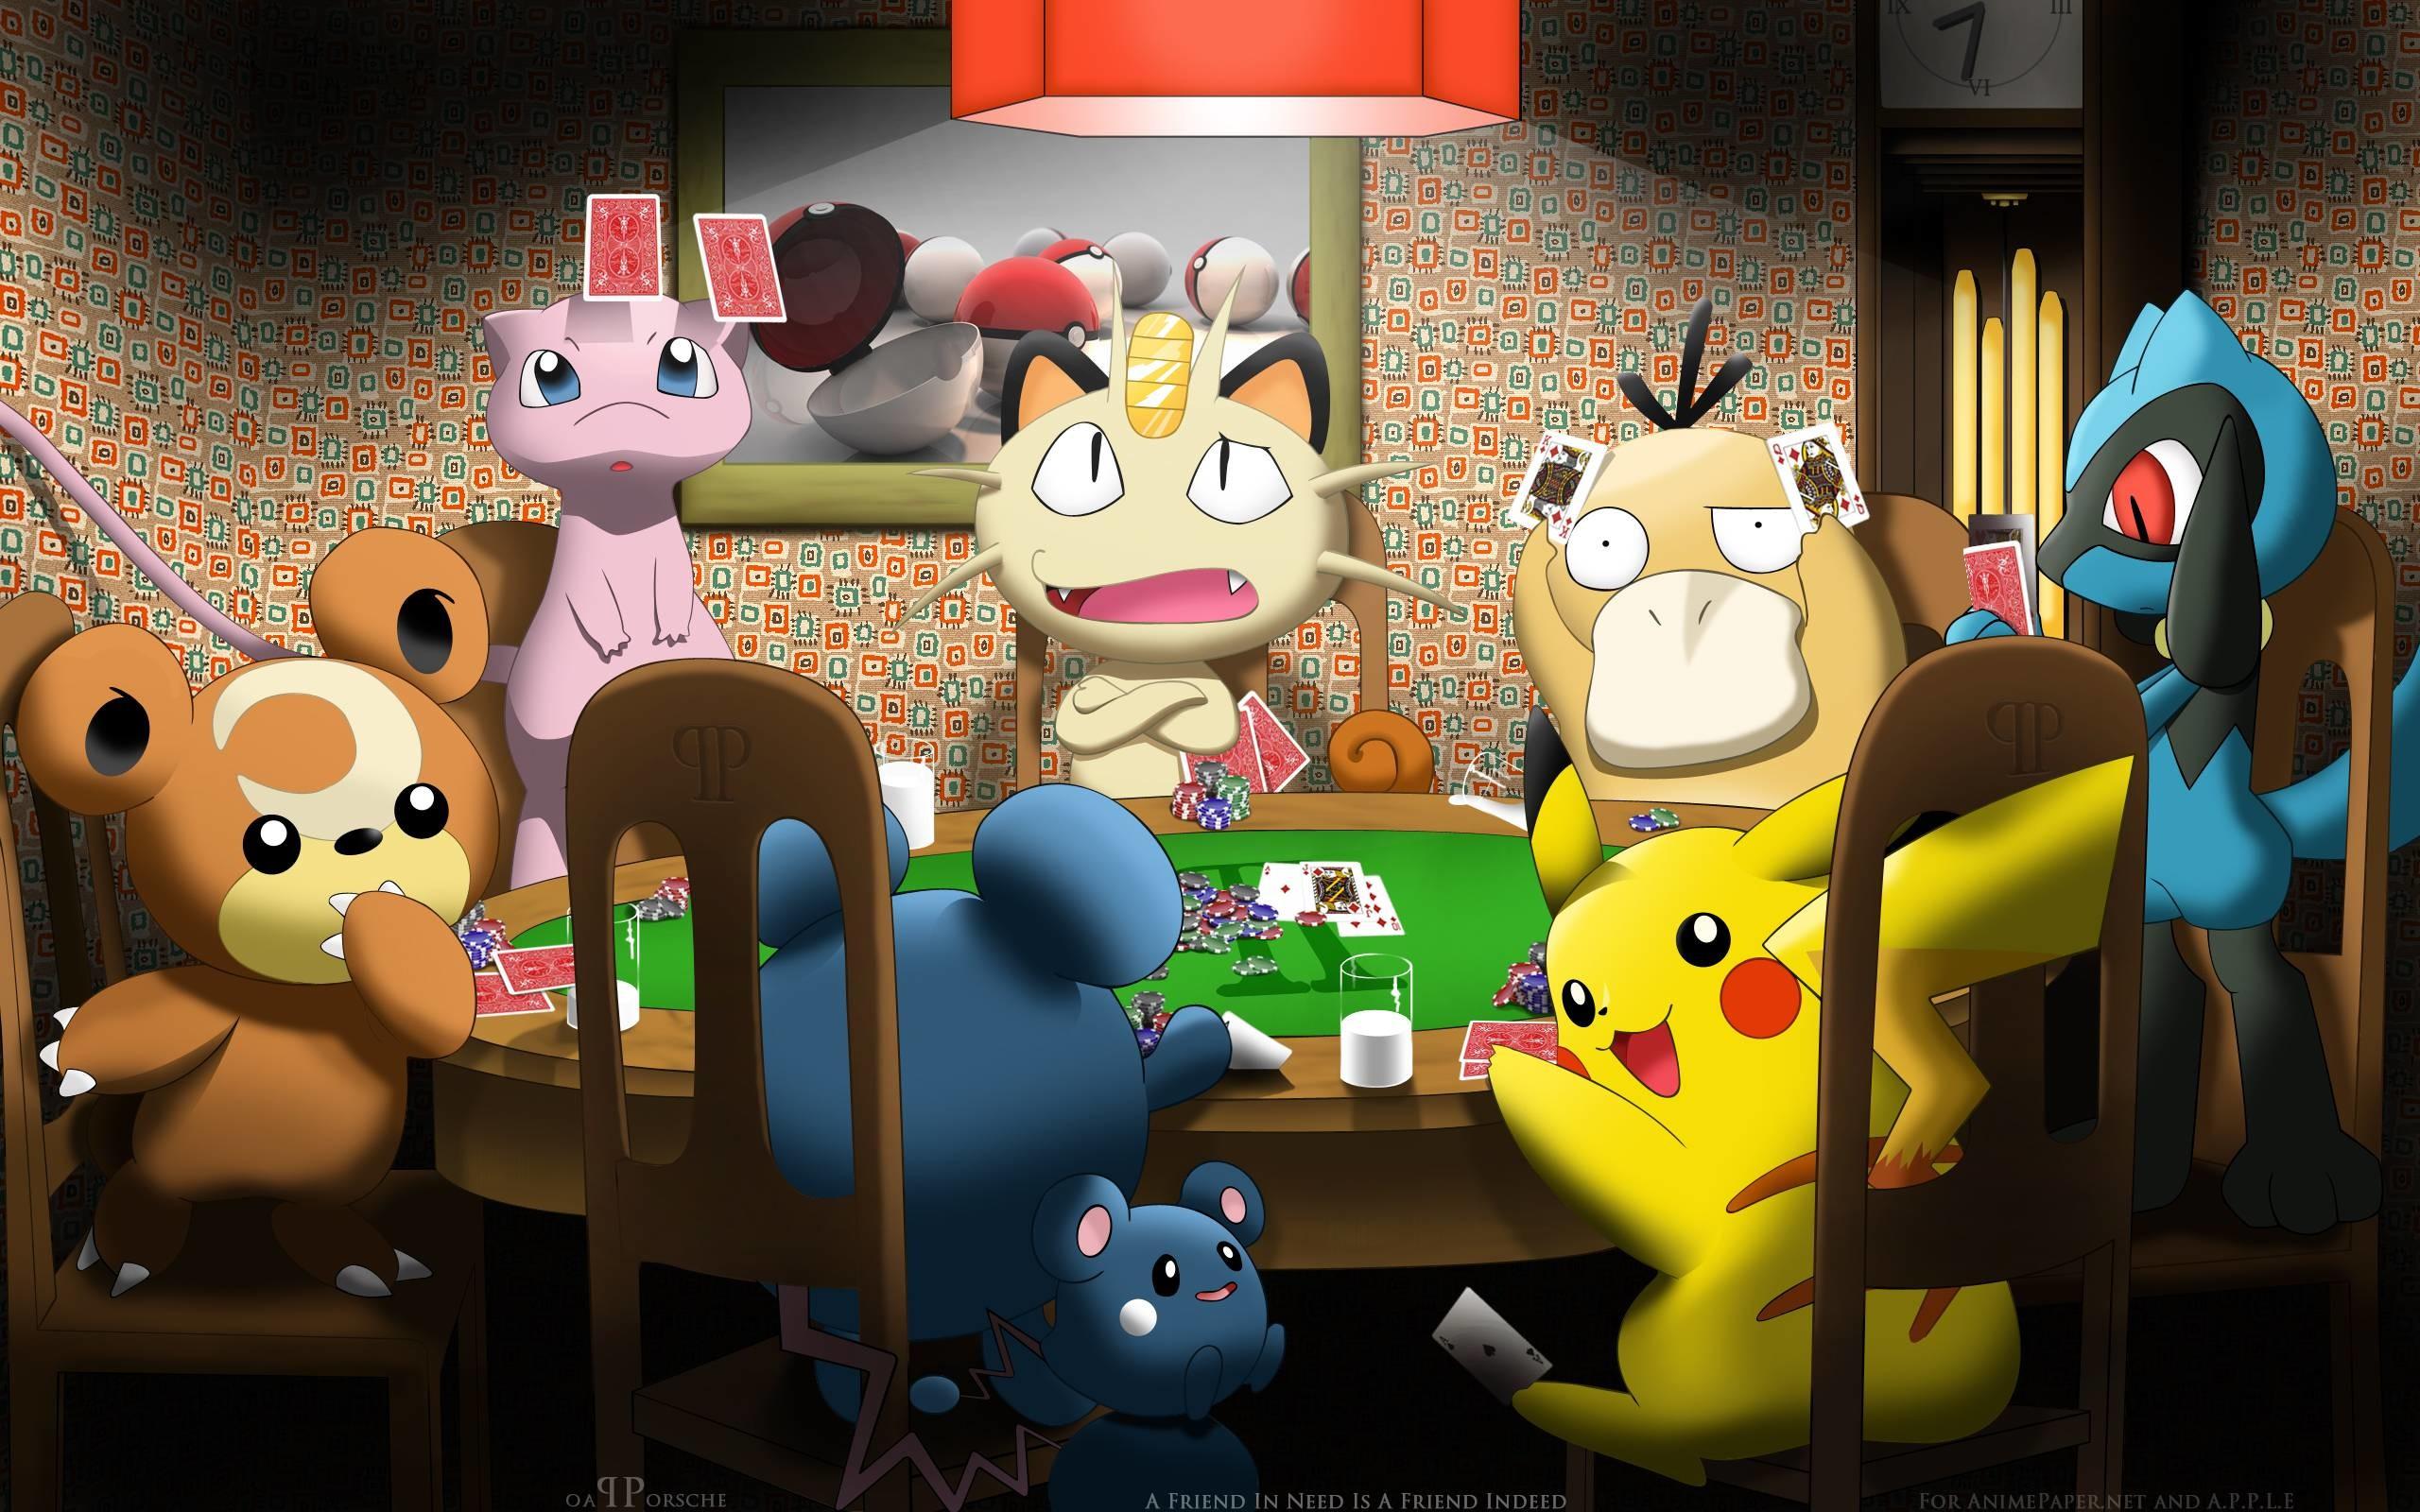 Epic Pokemon Wallpaper, Cartons & Animations Wallpaper, hd phone .